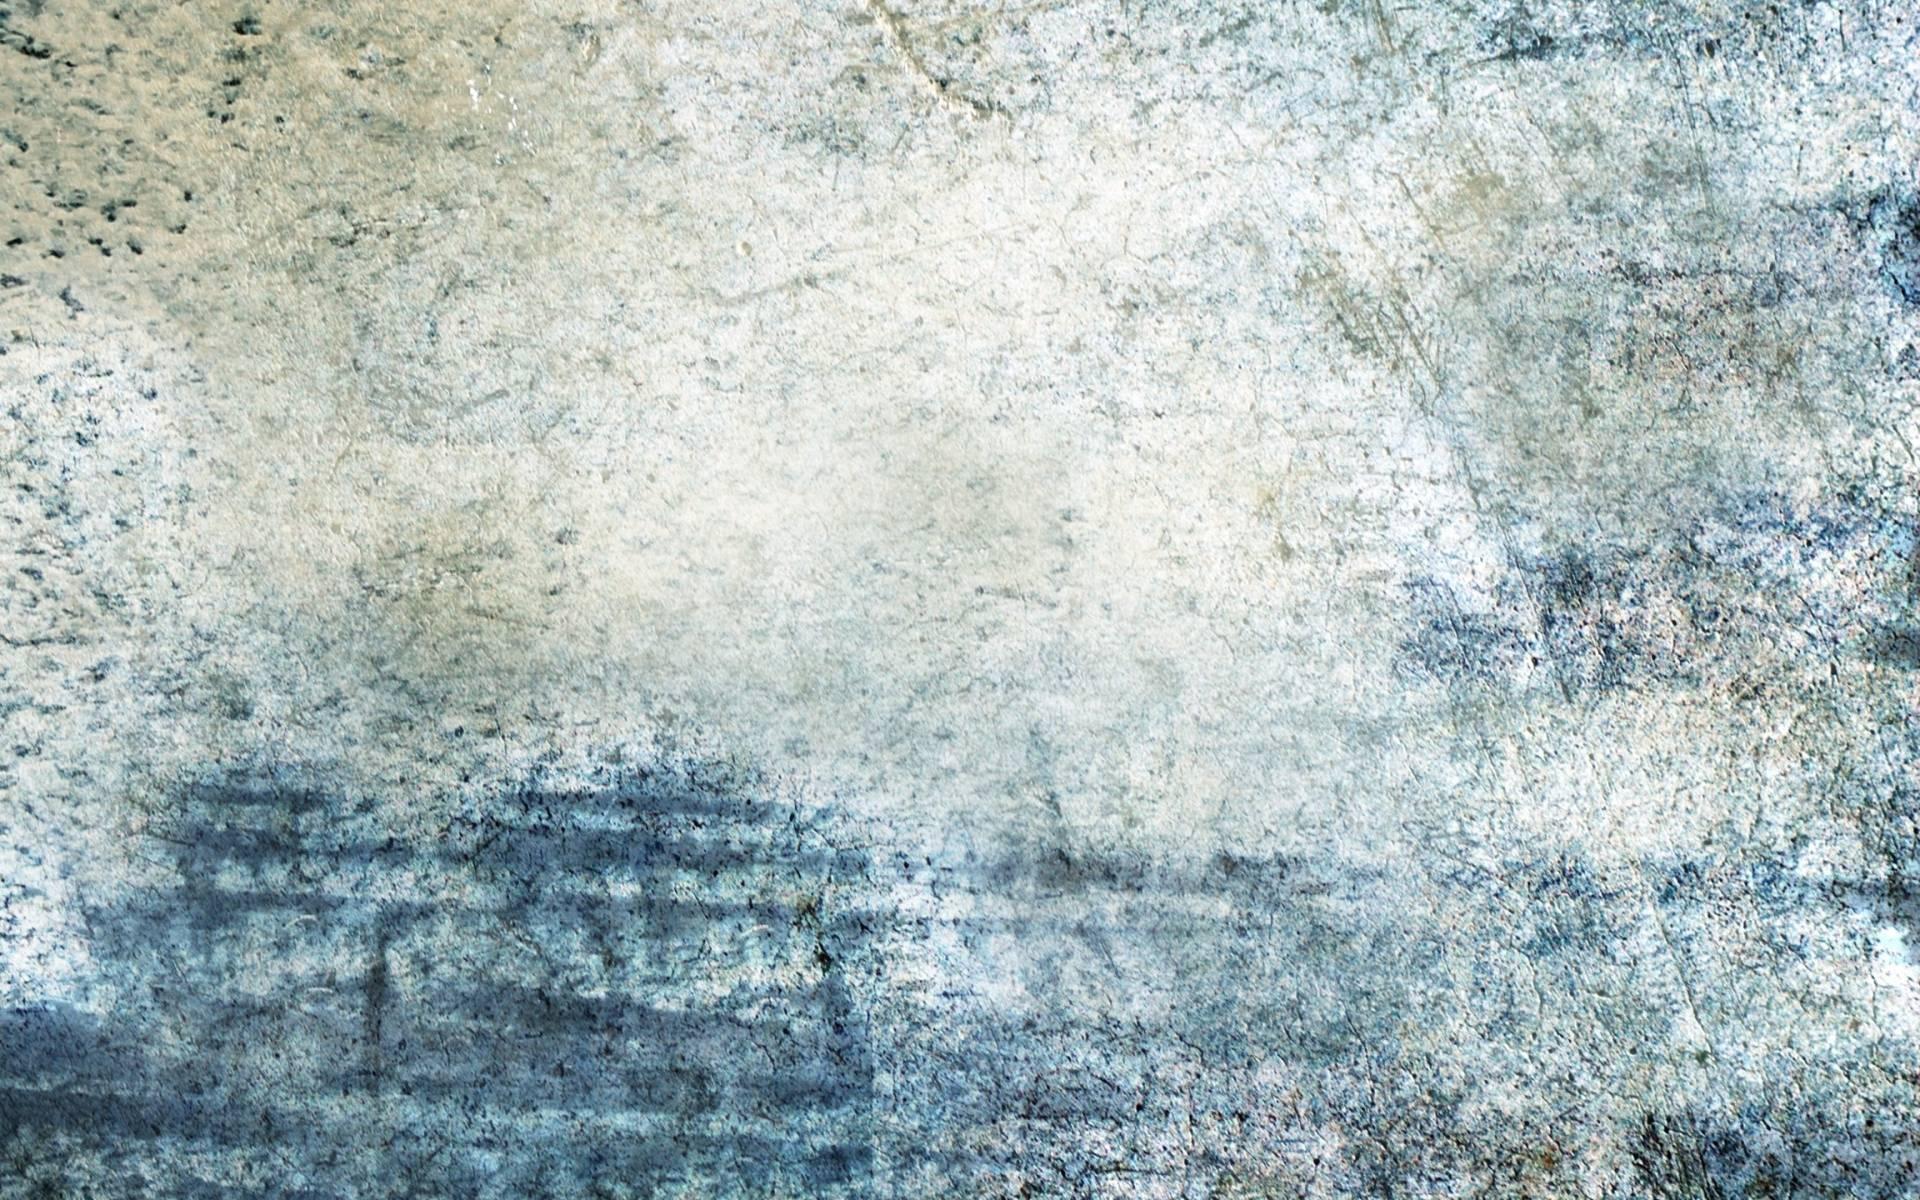 grunge desktop wallpapers 003